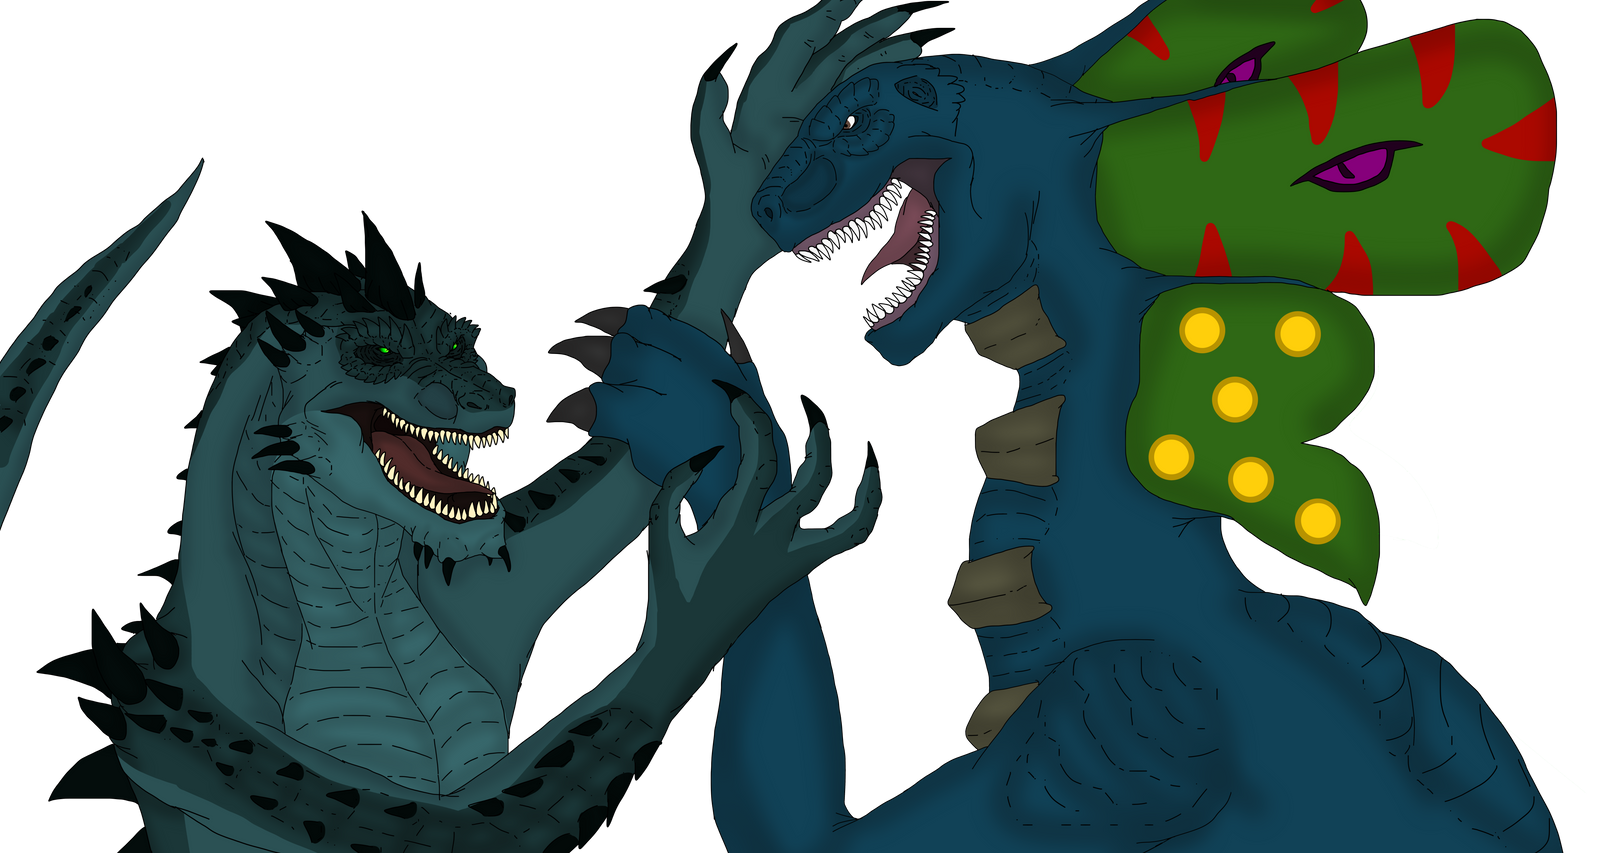 Art trade - Eyepod vs Varmordor by Redspets